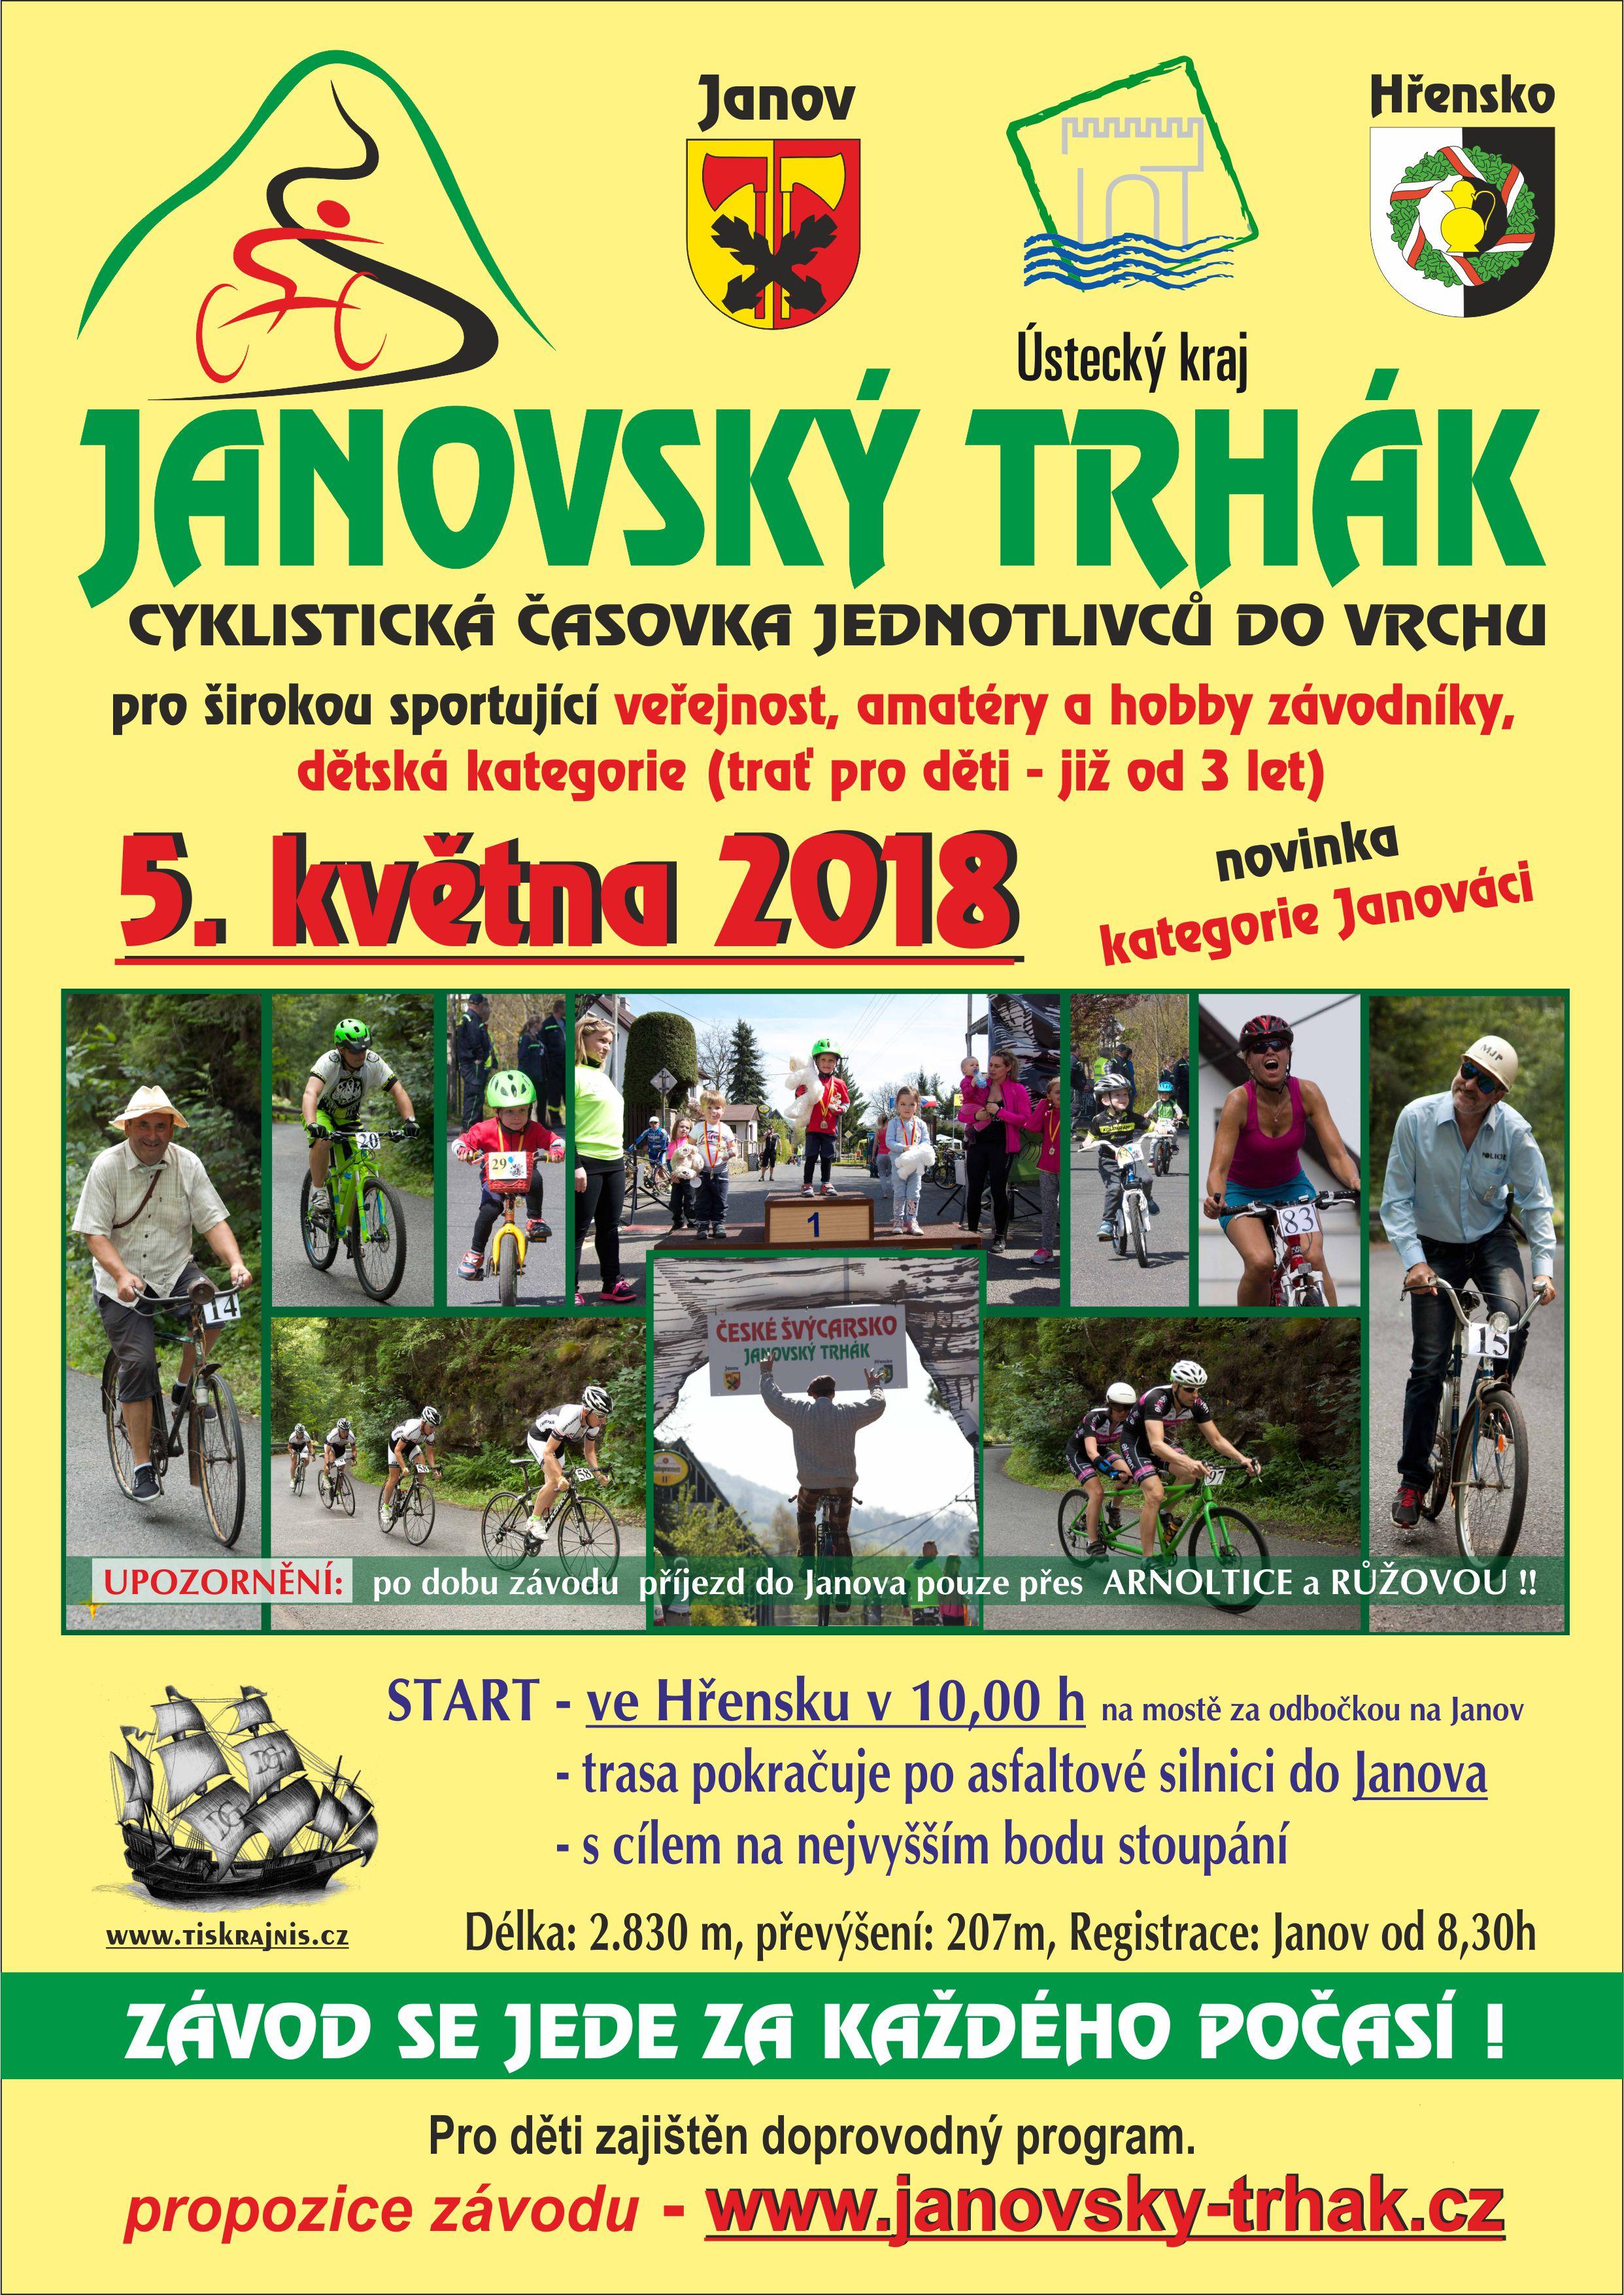 Janov - trhák 2017